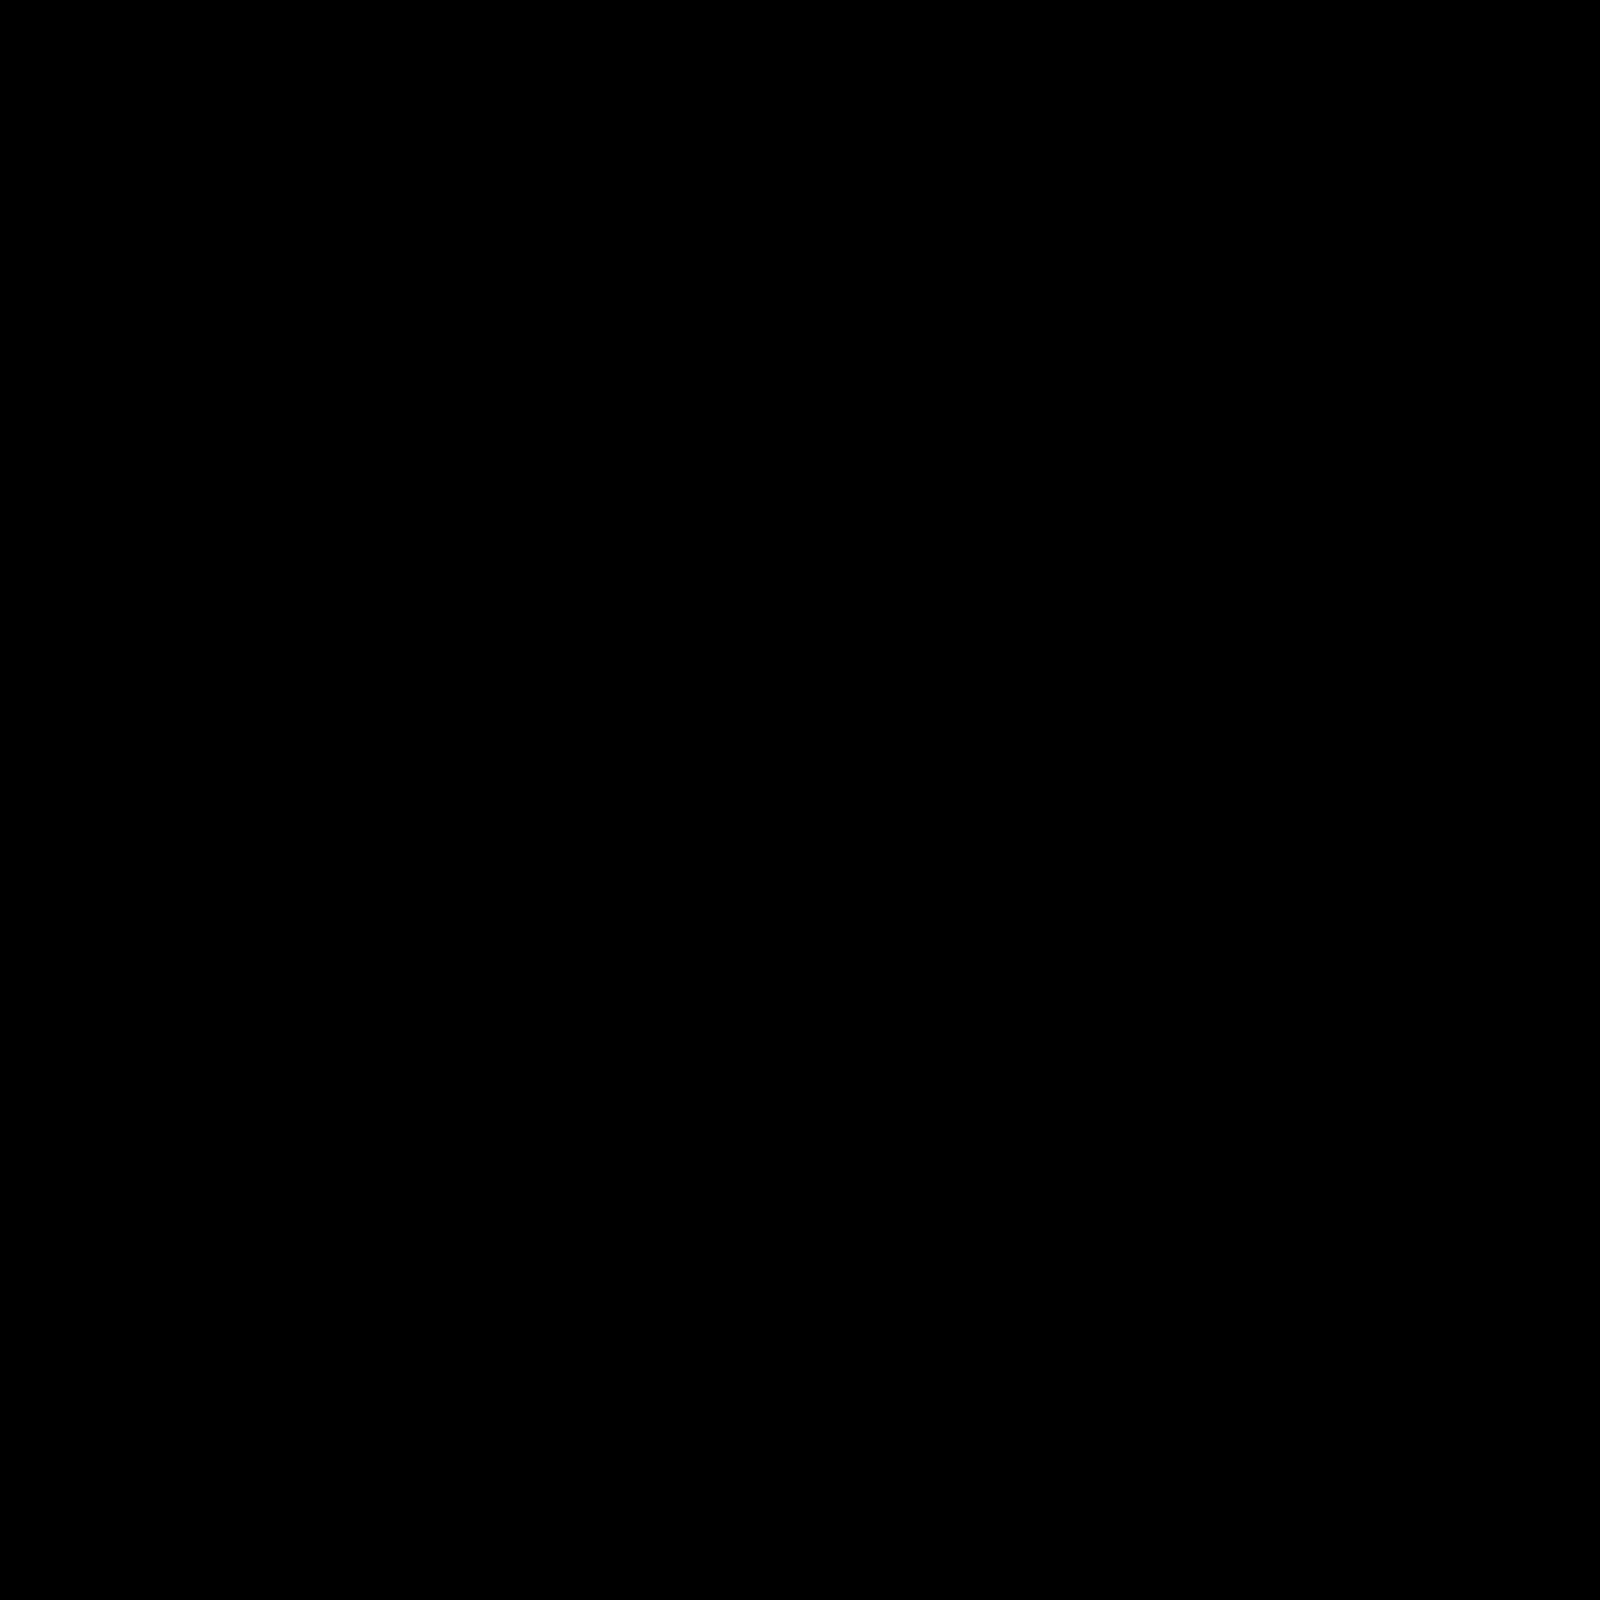 Бумажные отходы icon